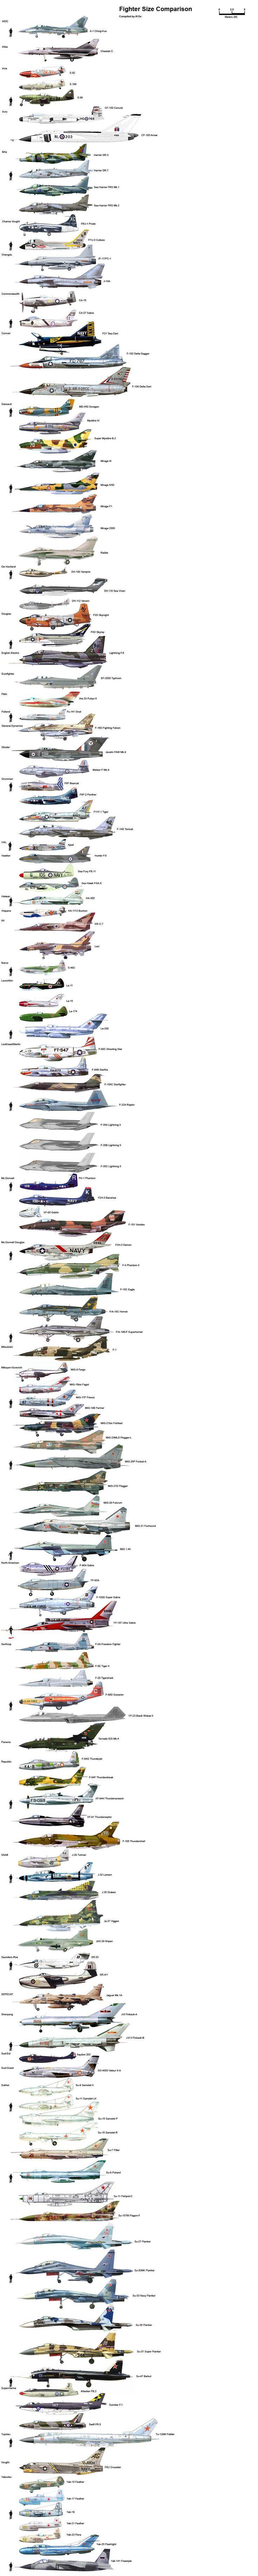 comparatif-taille-avion.jpg (1000×10000)